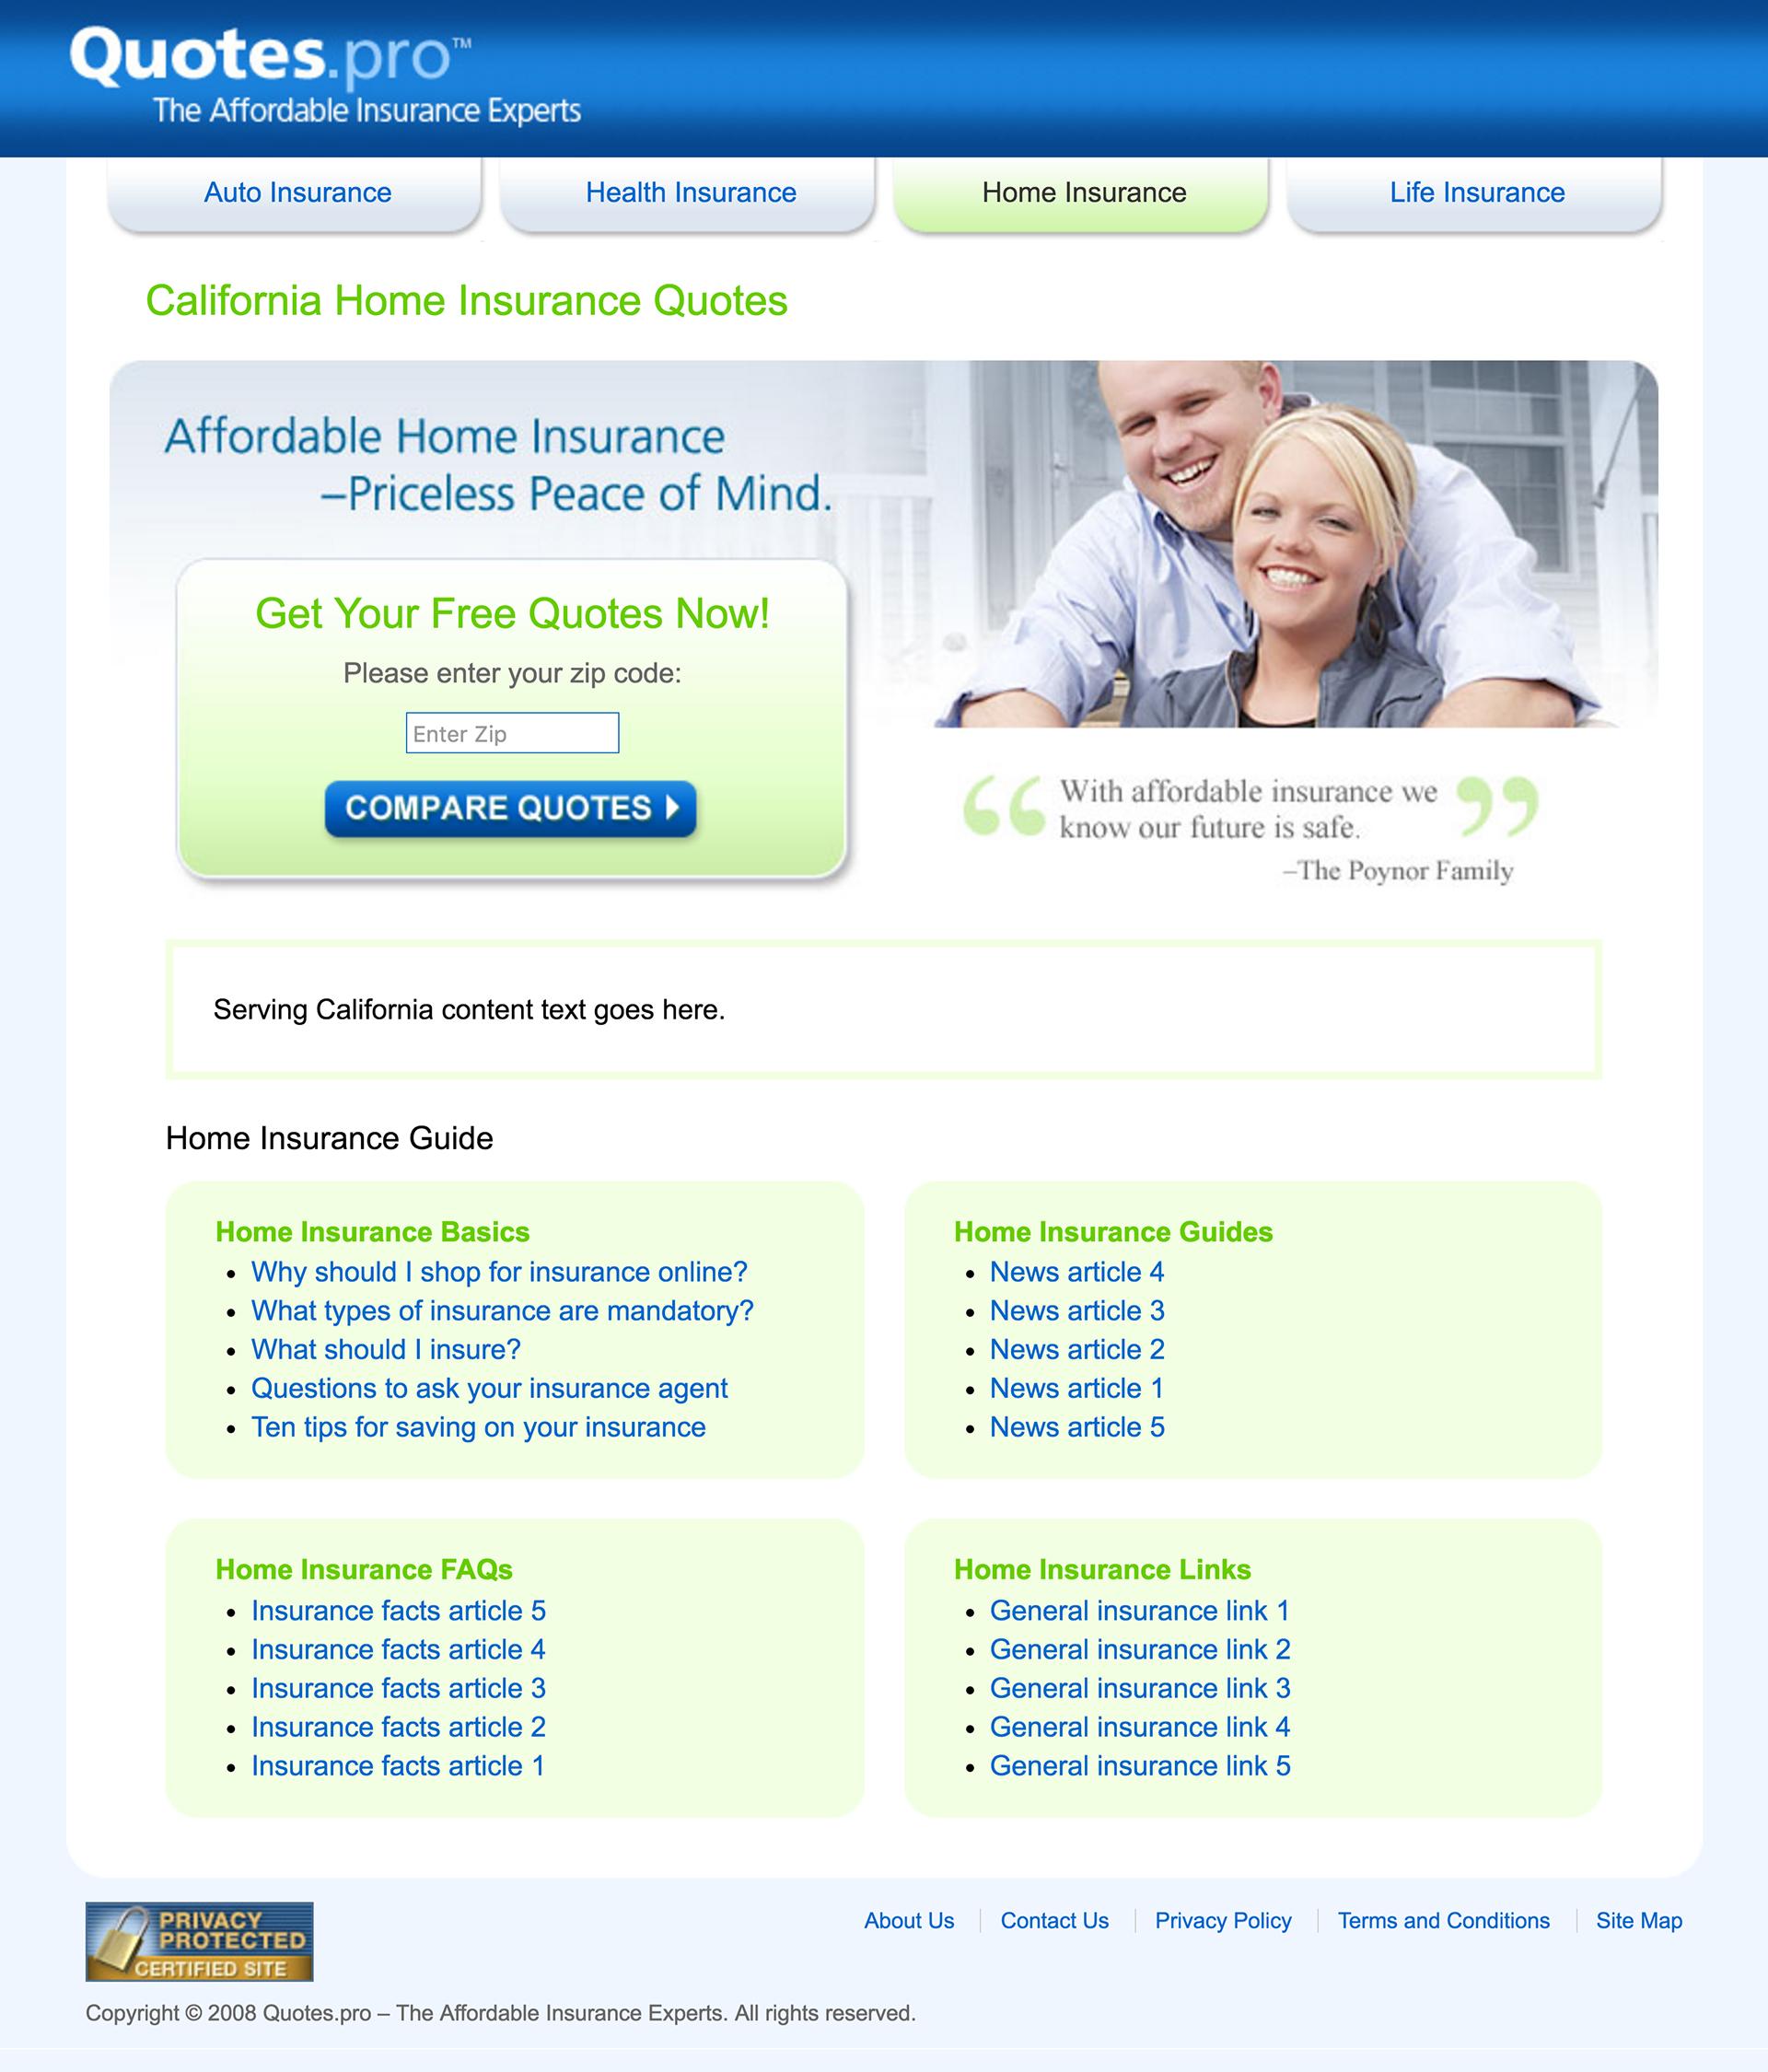 Life Insurance Quotes California Dan Poynor